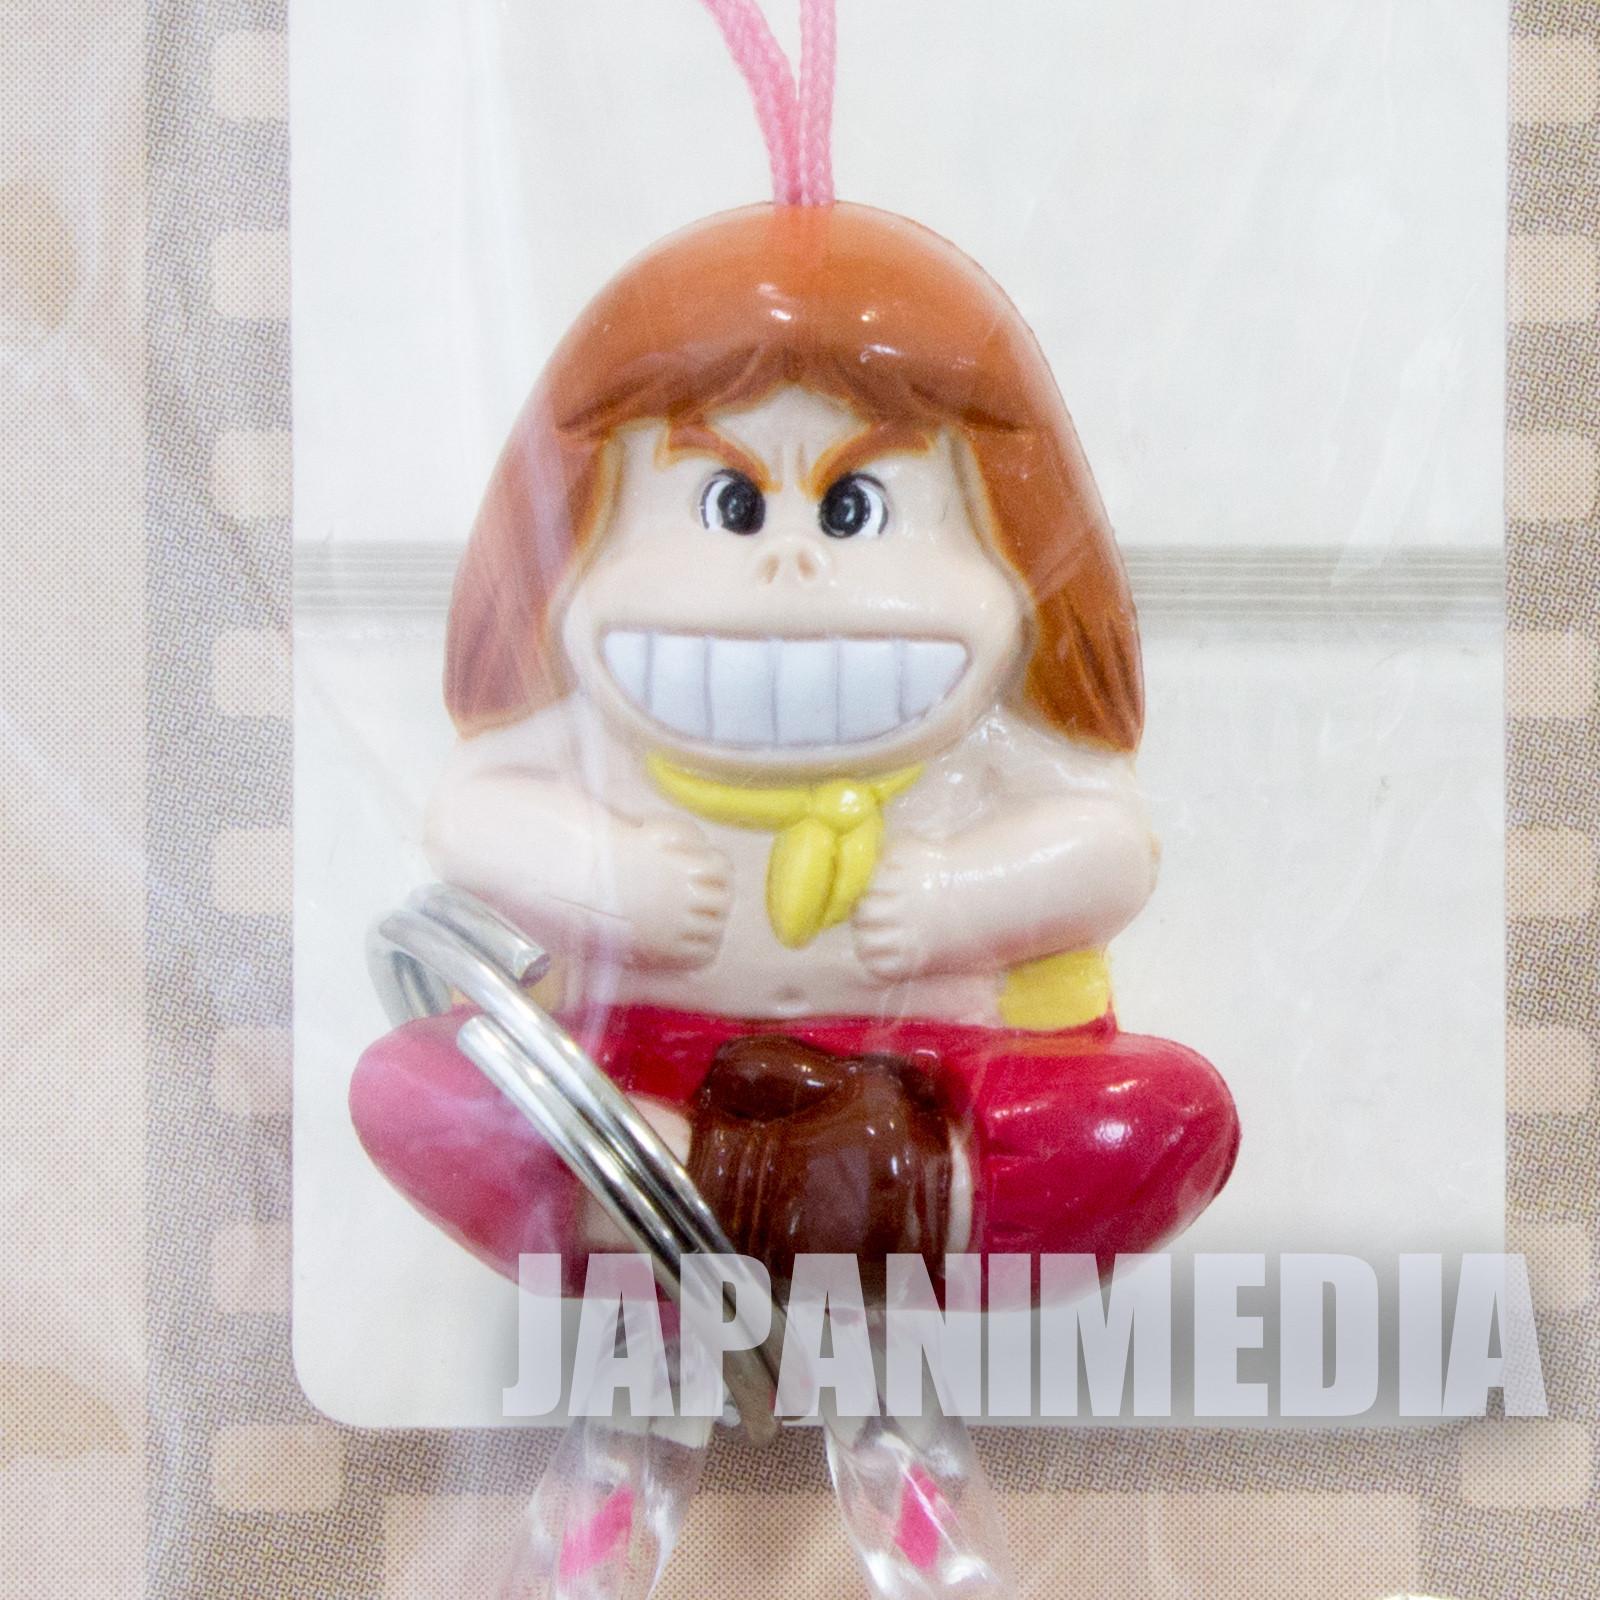 Retro RARE! Future Boy Conan Jimsy Figure Strap JAPAN ANIME HAYAO MIYAZAKI